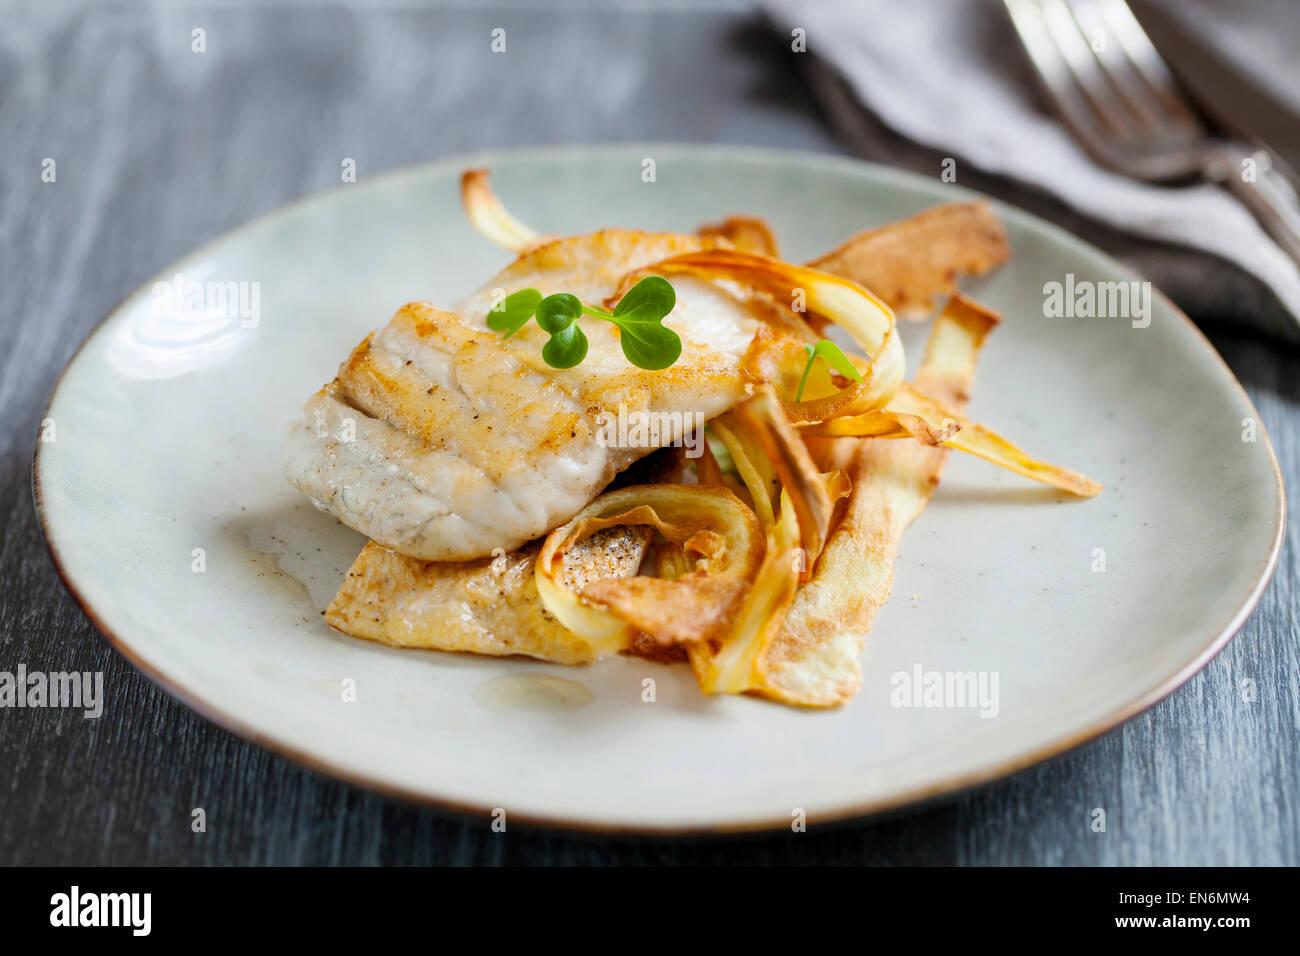 Pan fried sea bass with parsnip crisps - Stock Image